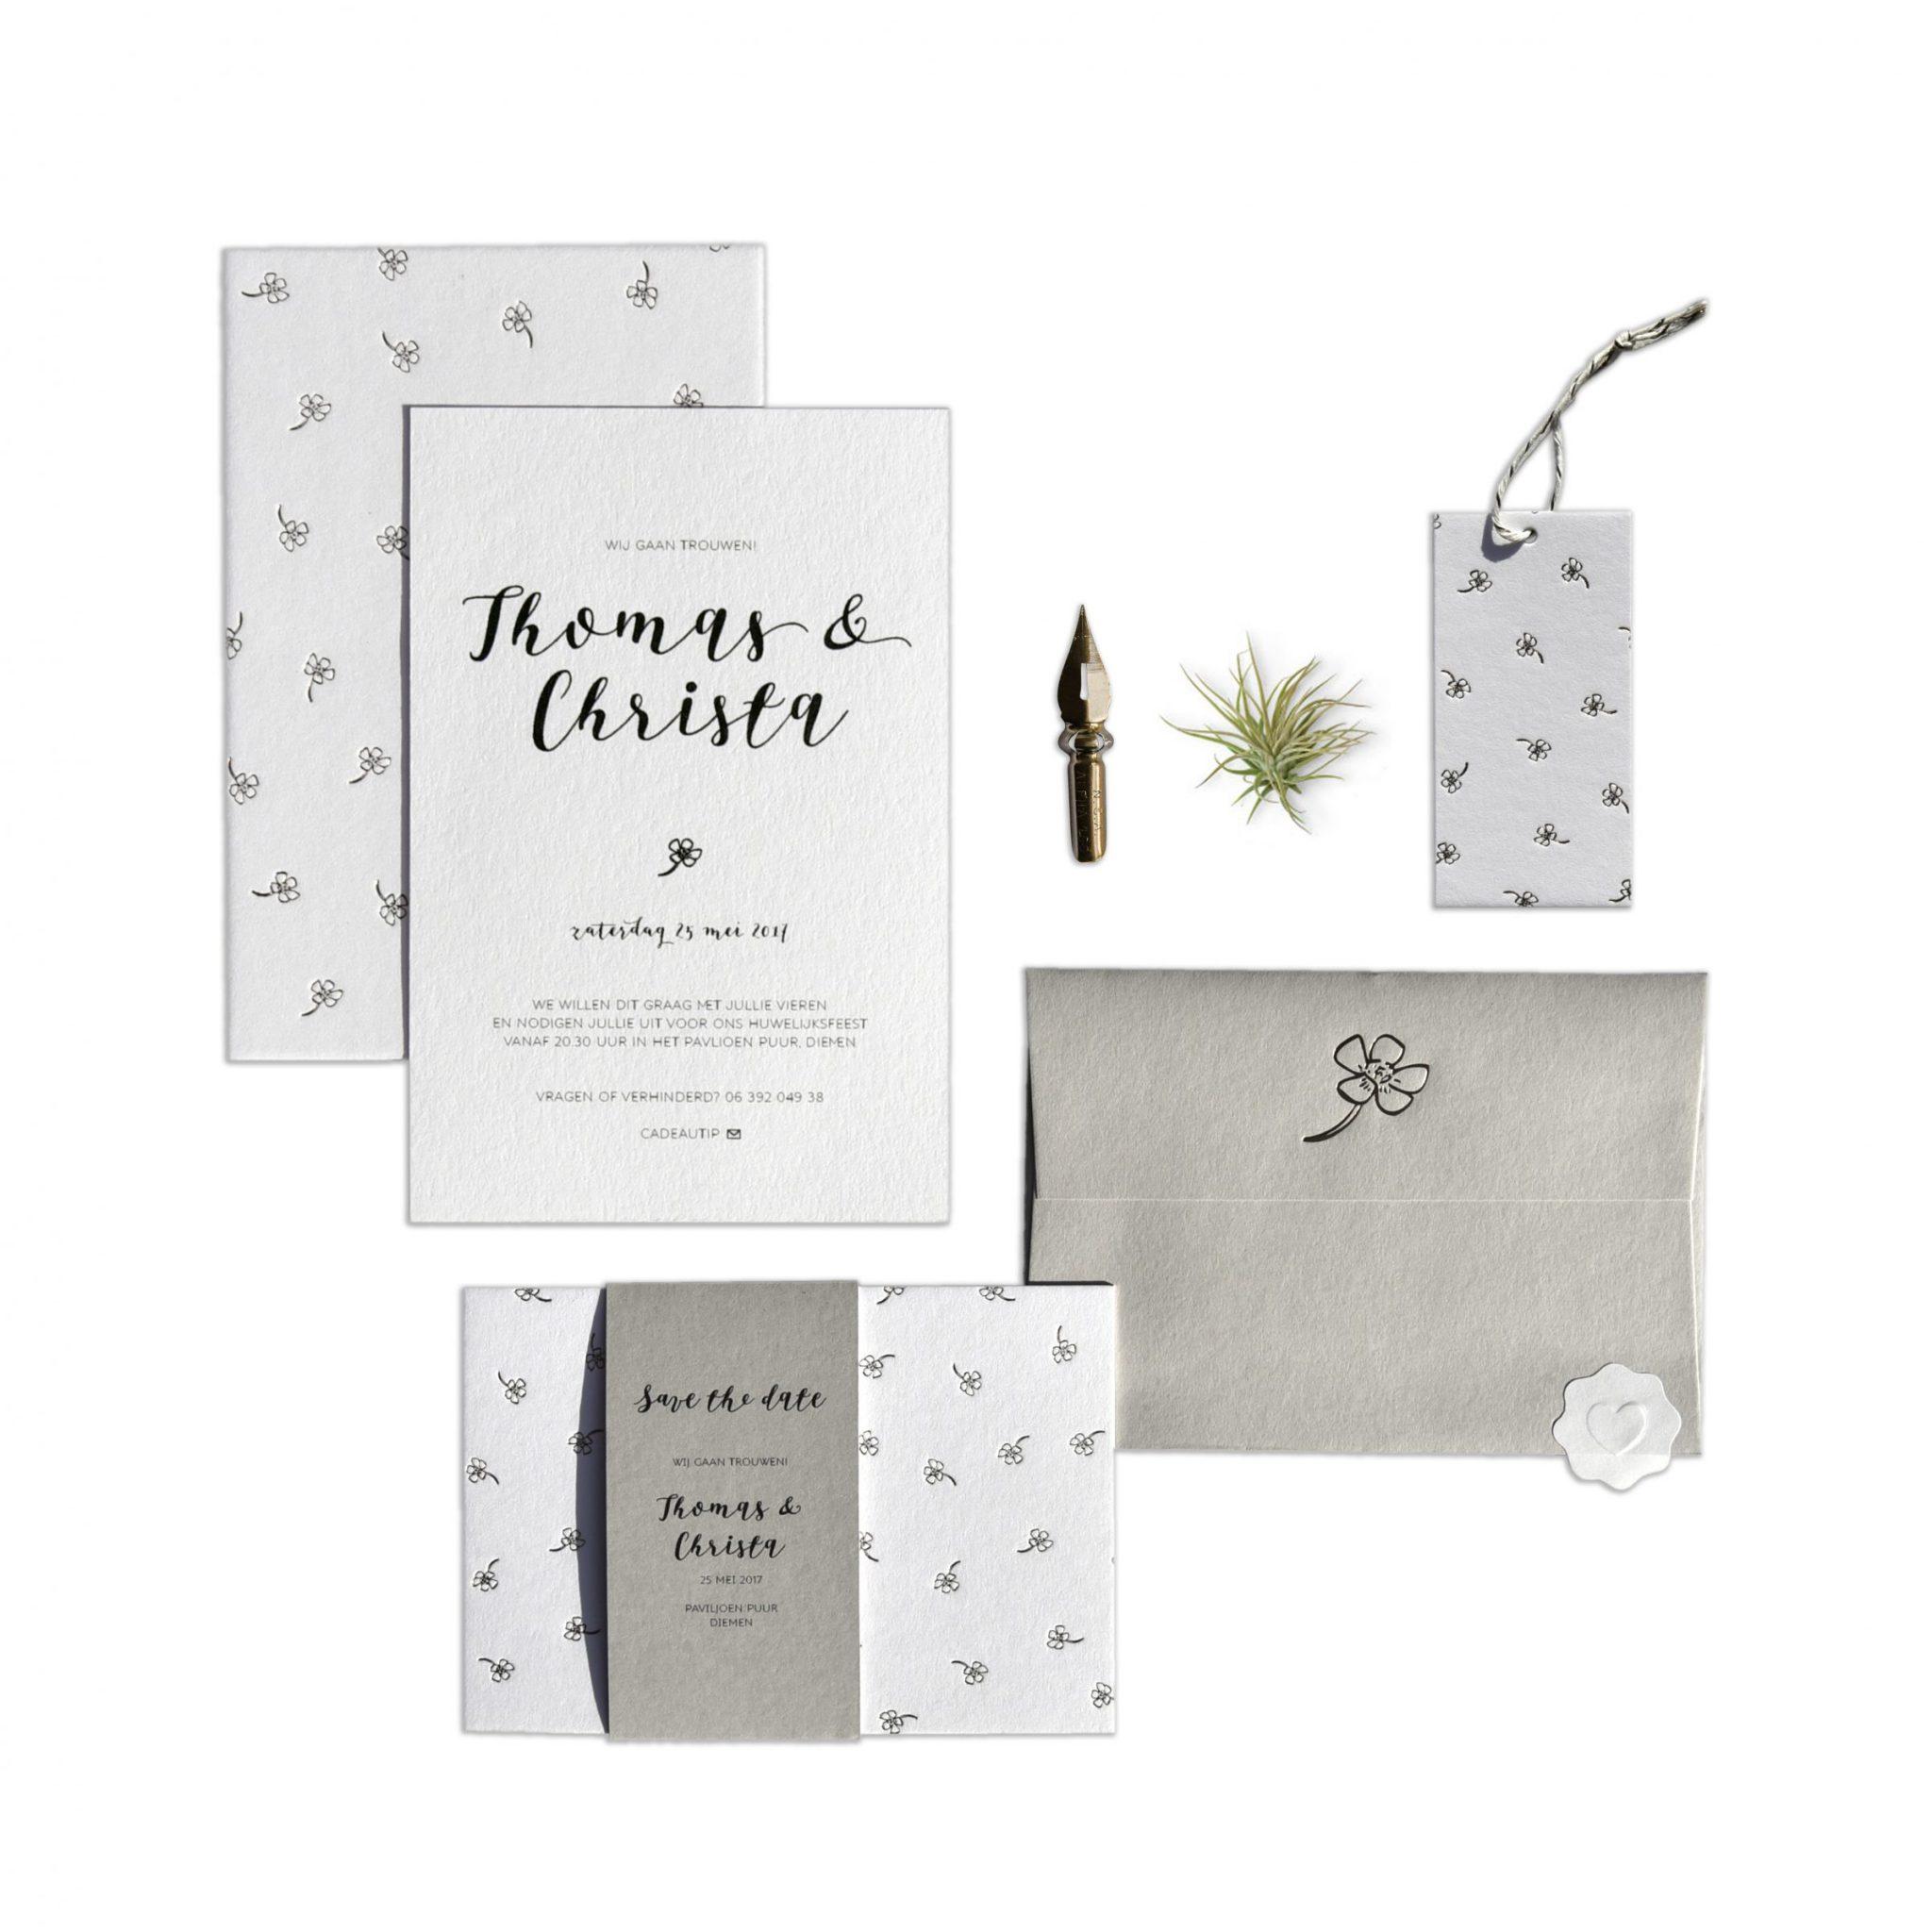 thomas_christa letterpers letterpress wedding invitation wedding trouwkaart